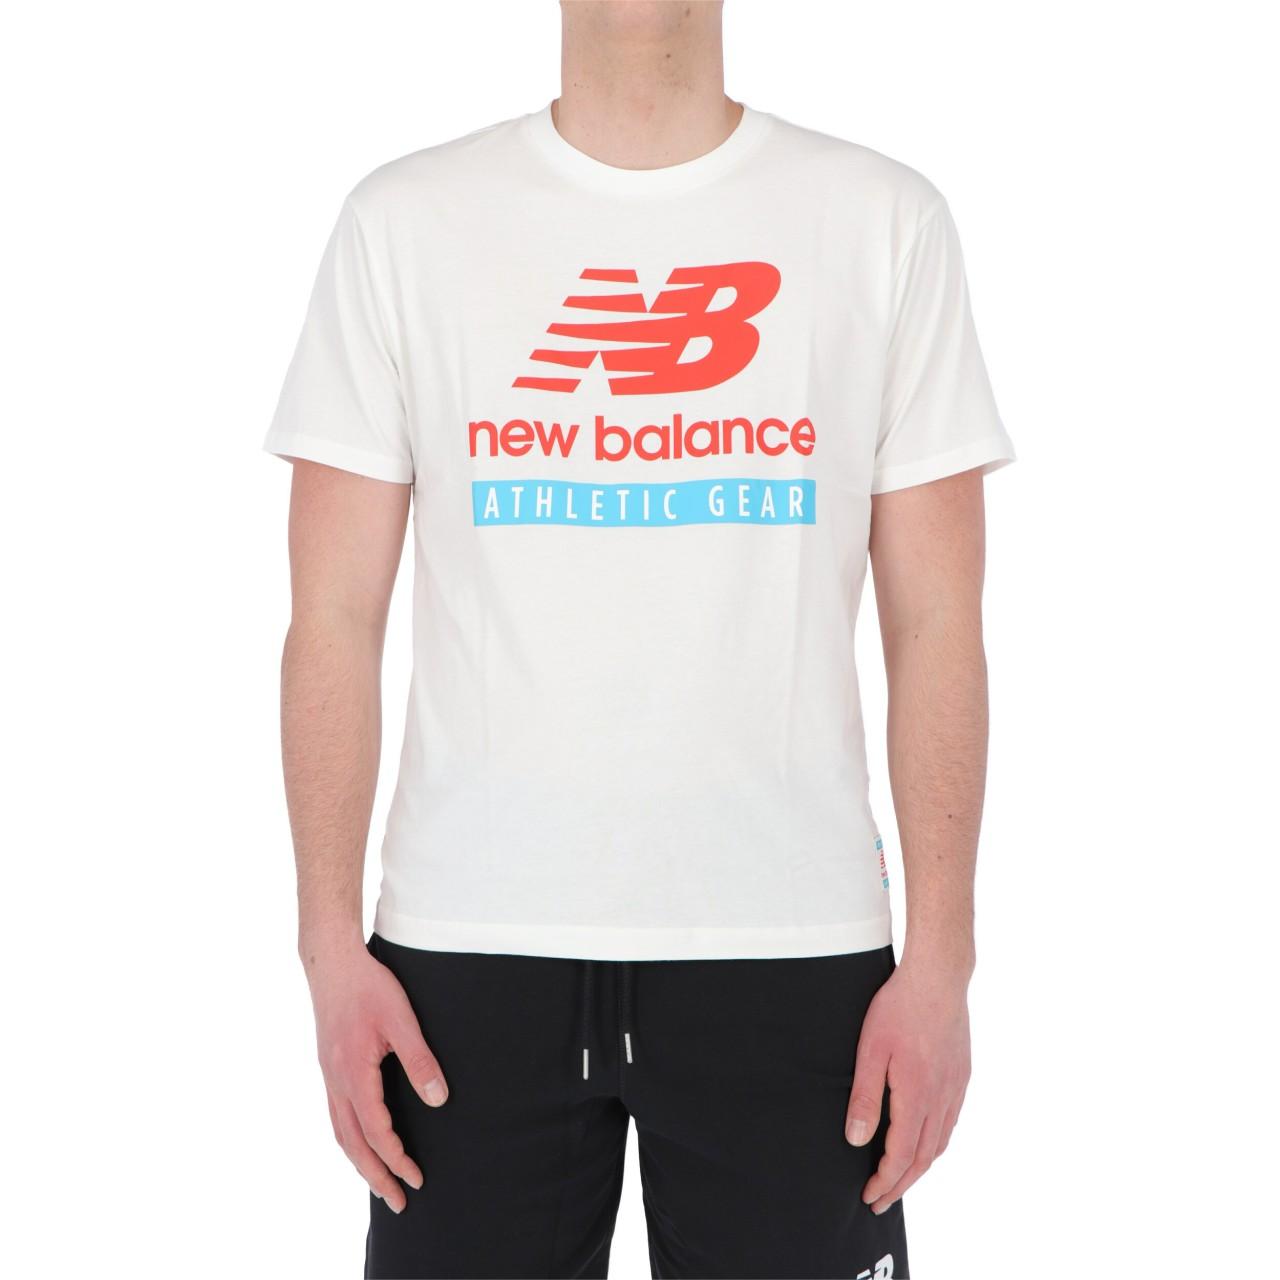 New balance Uomo Tshirt New Balance Uomo Essential Logo Tee 11517P